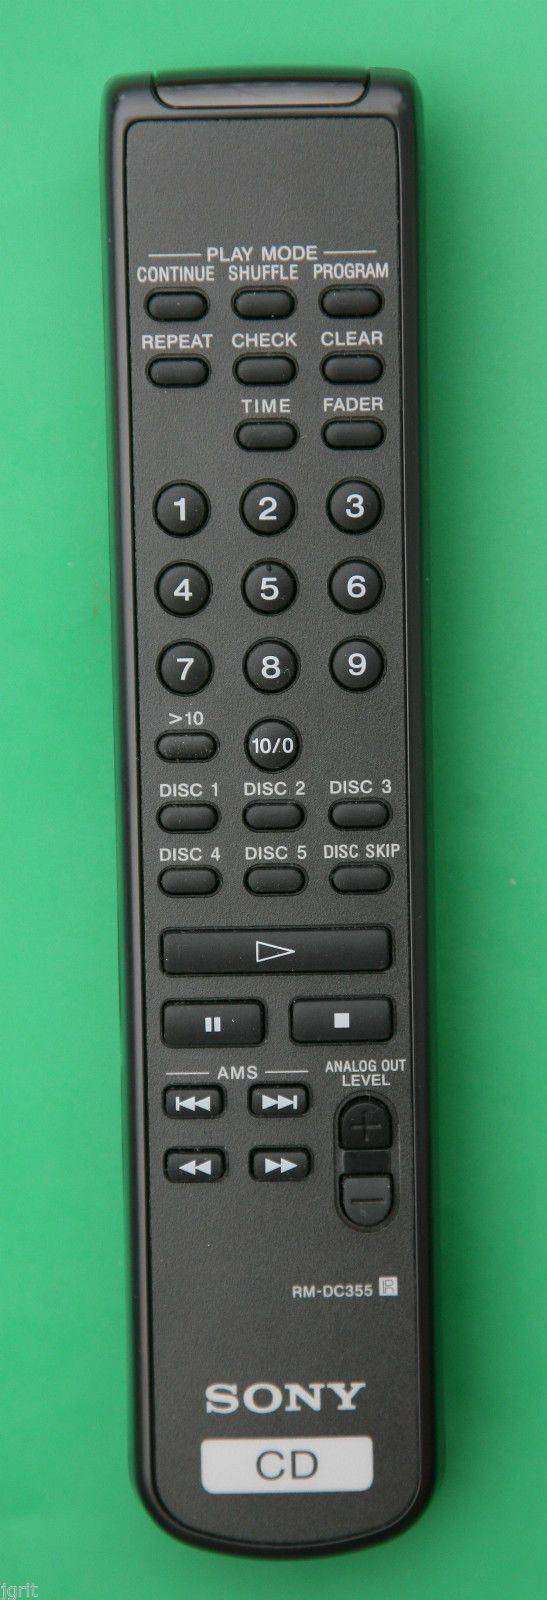 Sony Rm Dc355 Remote Control Cd Changer Cdp C5cs C5csb